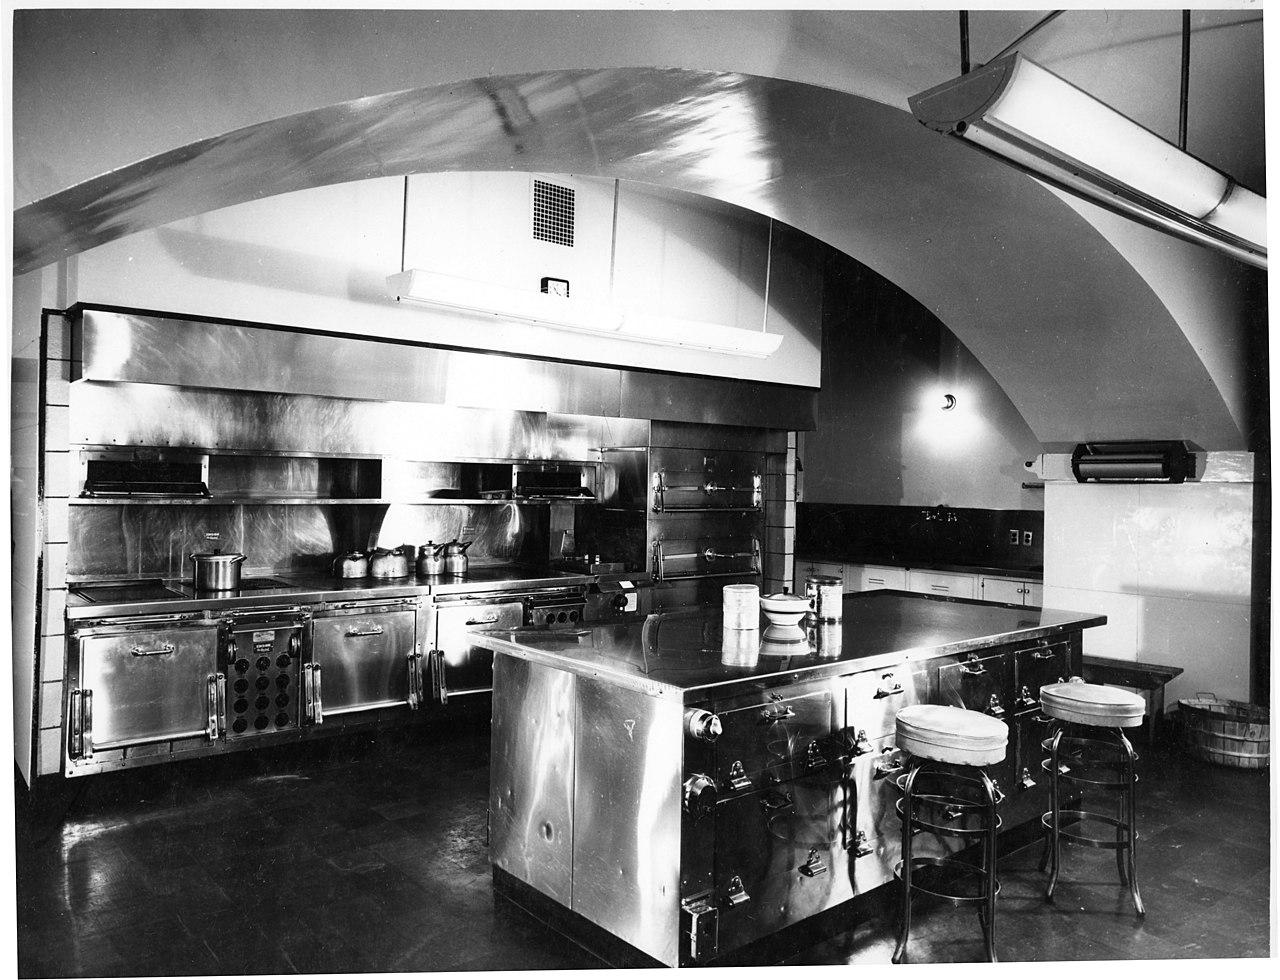 Established Kitchen Design Company In The Old Lyme